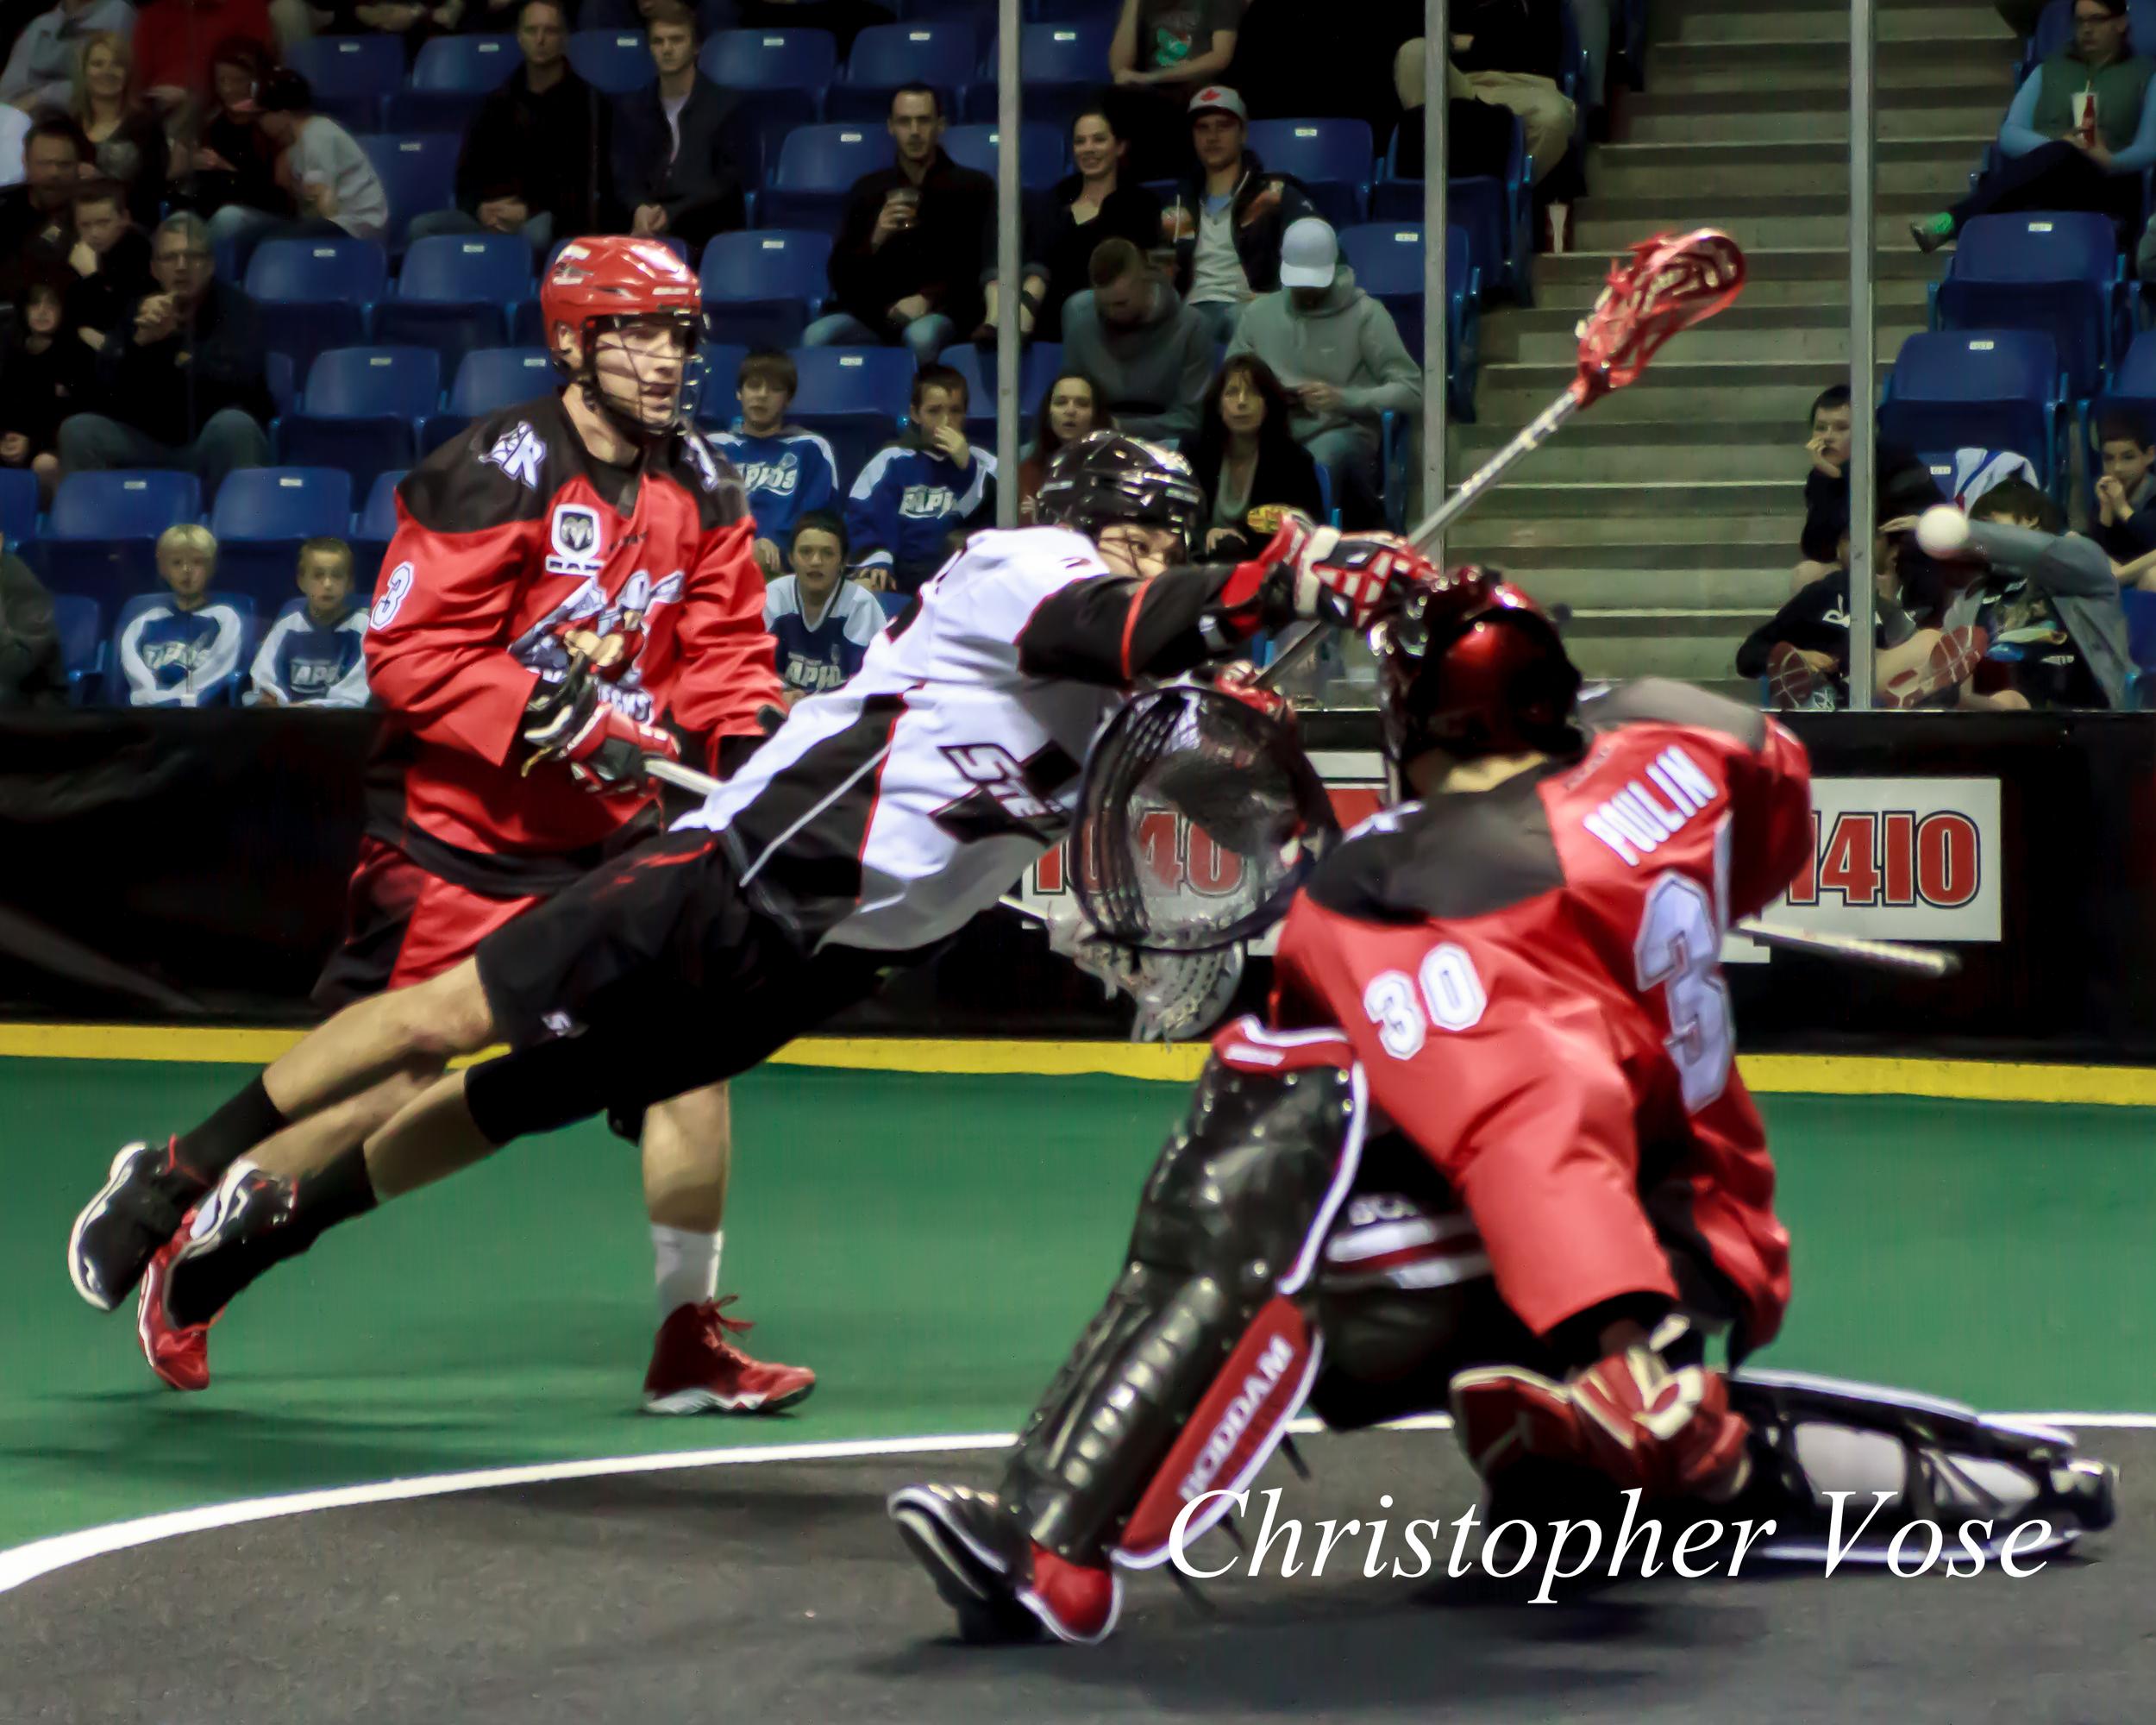 2014-03-21 Brett Bucktooth Goal.jpg